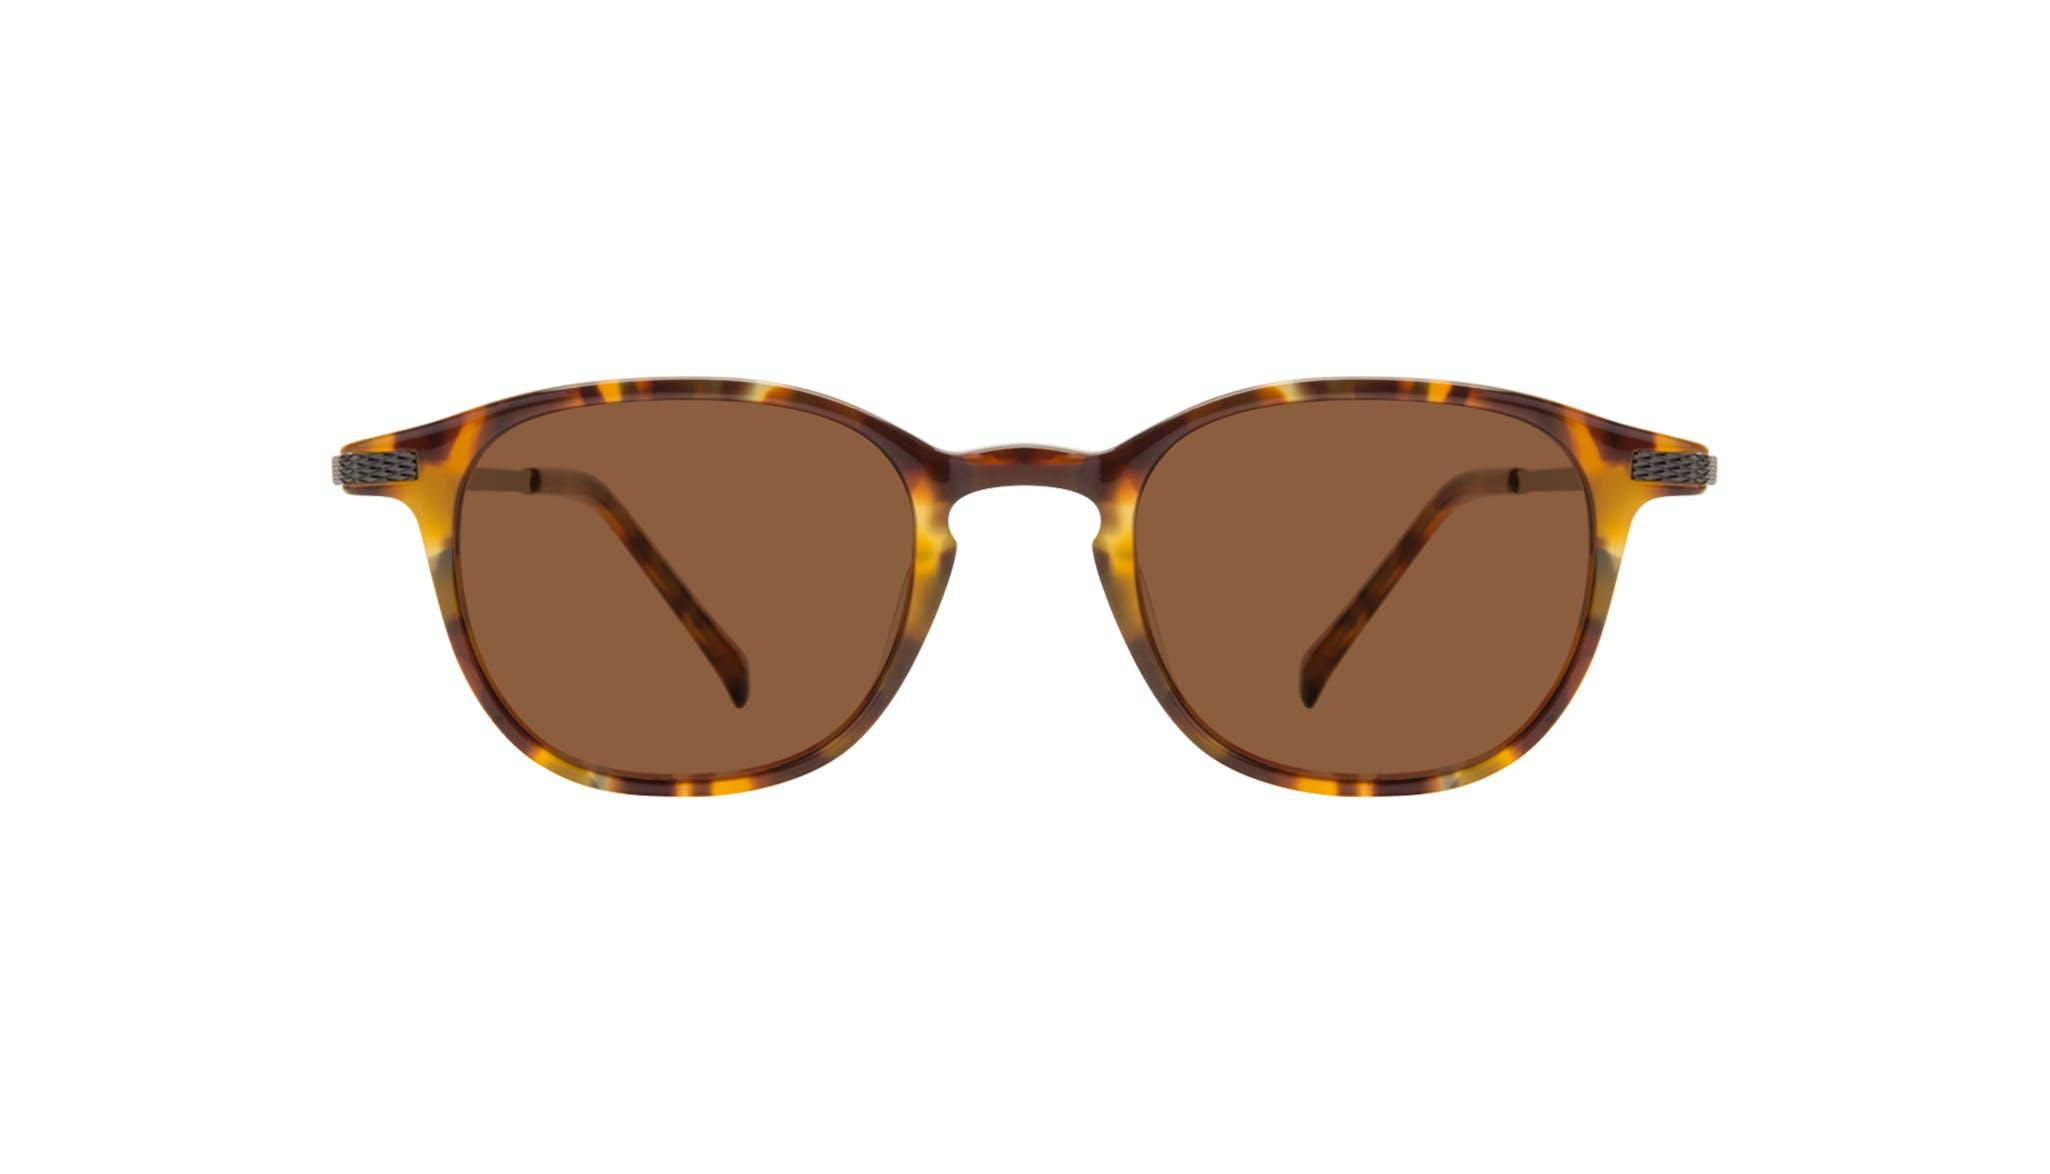 Affordable Fashion Glasses Round Sunglasses Men Tux Havana Tort Front